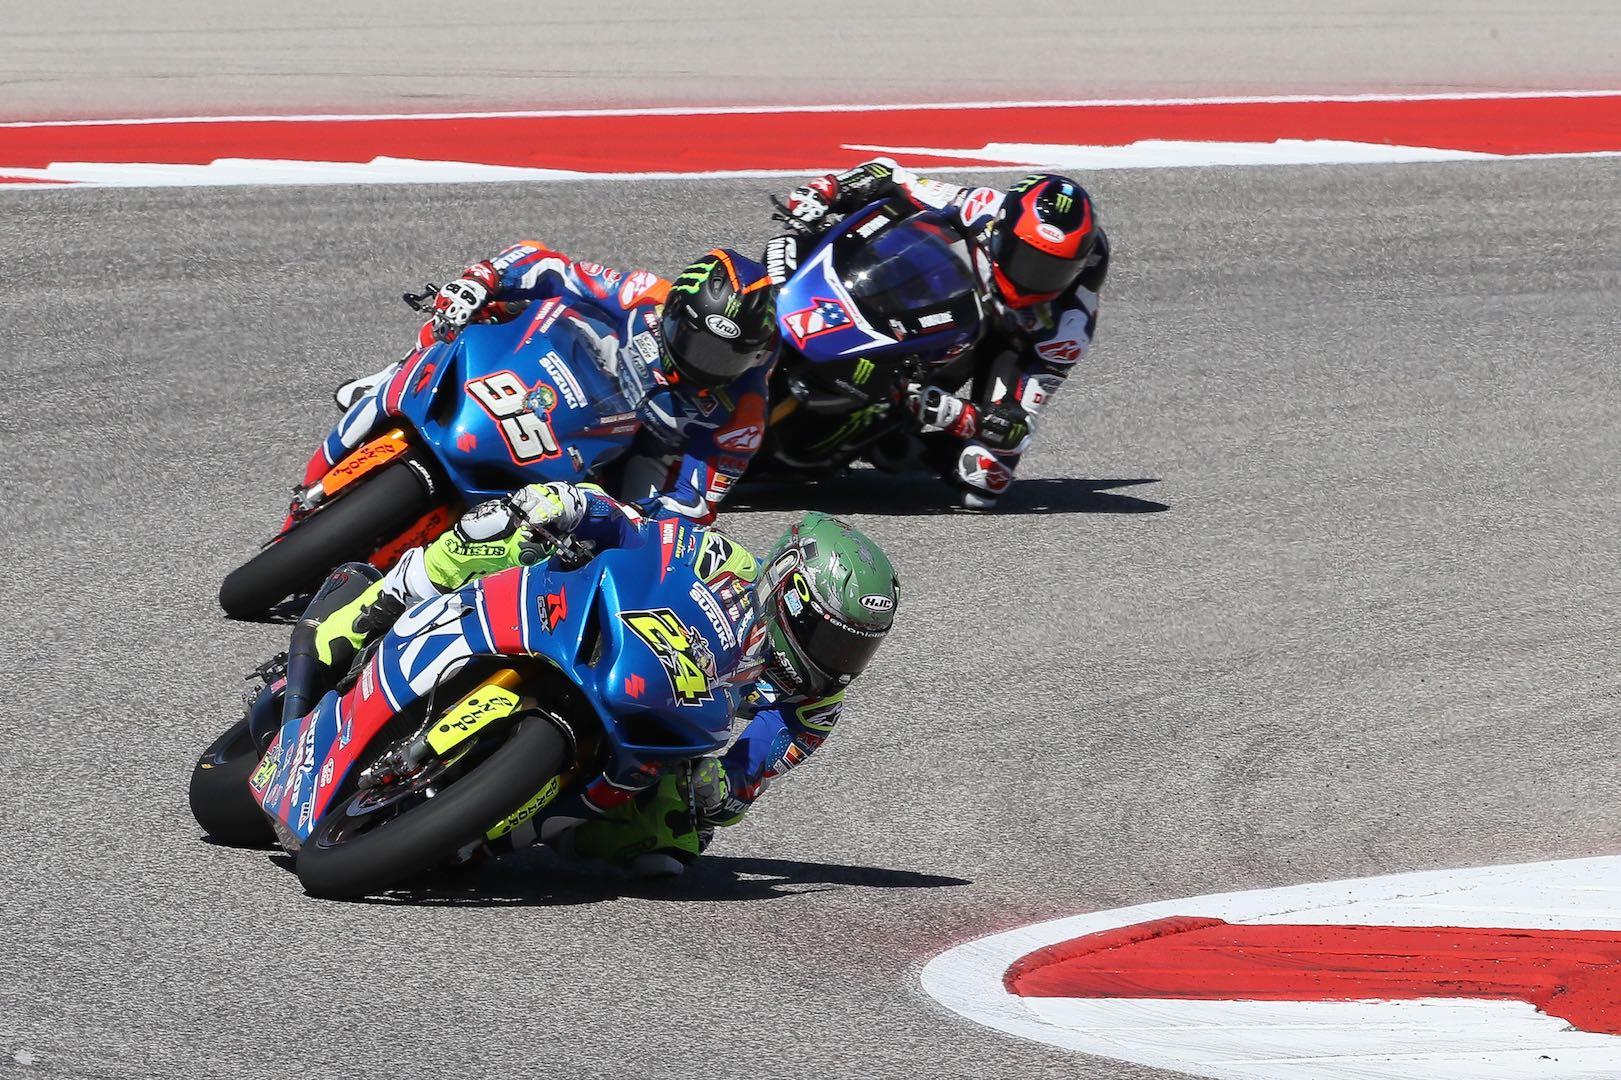 2017 Austin MotoAmerica Results: Suzuki's Elias Sweeps COTA…Again